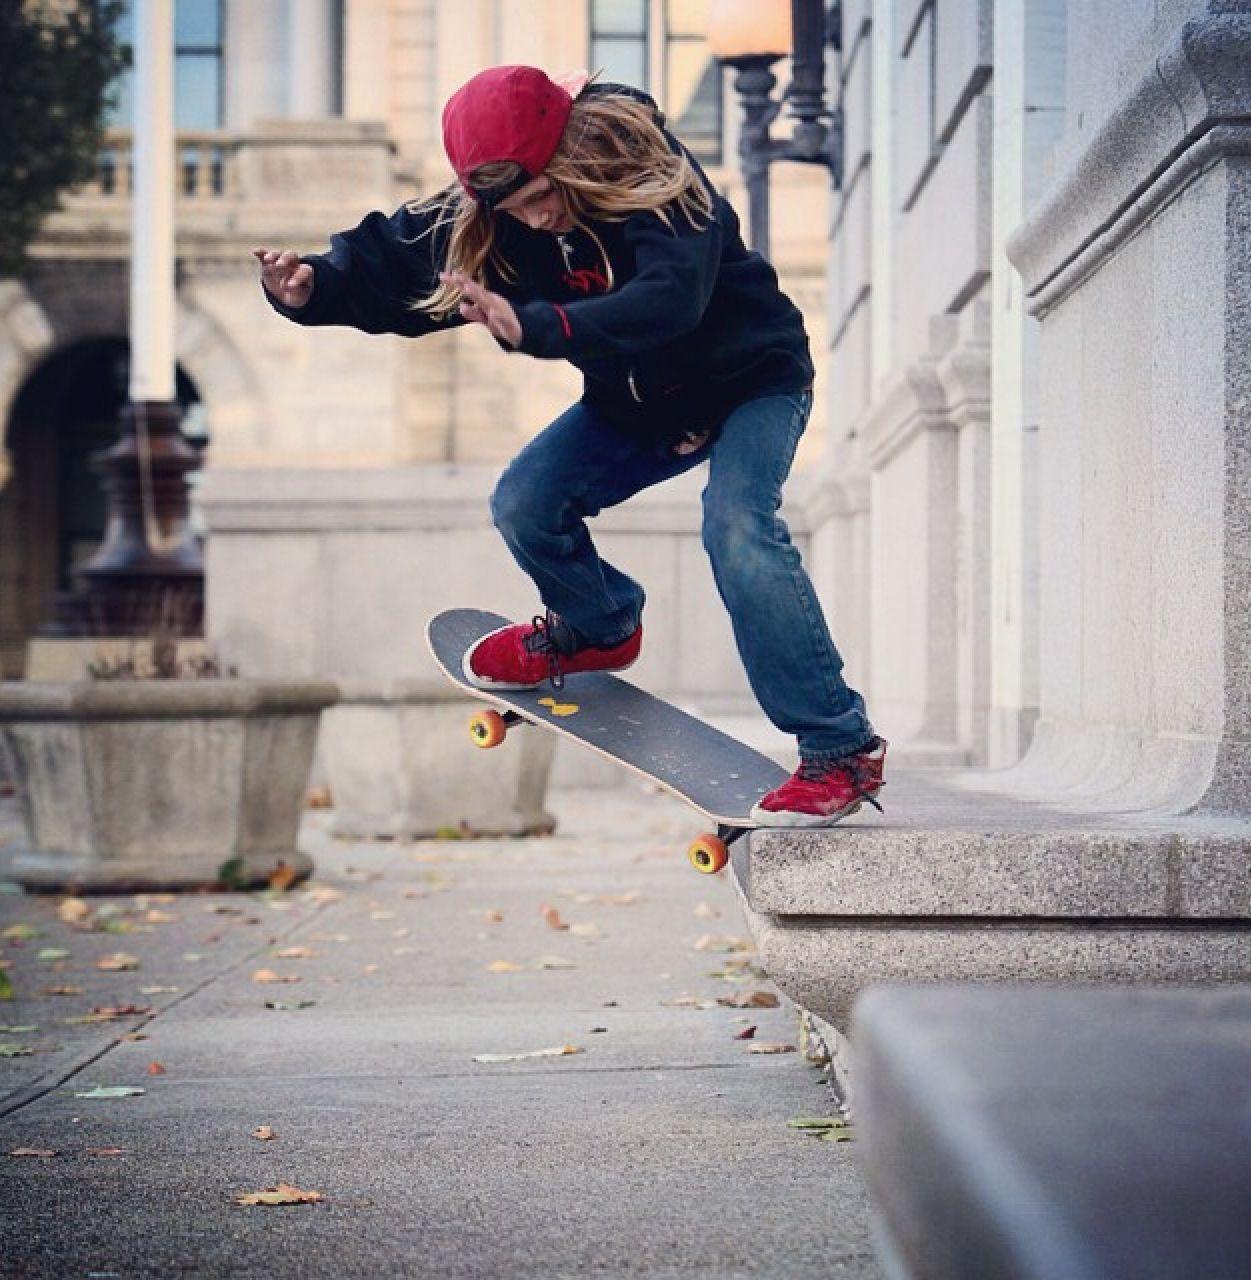 Crook Grind Skateboard, Tony hawk, Action sports